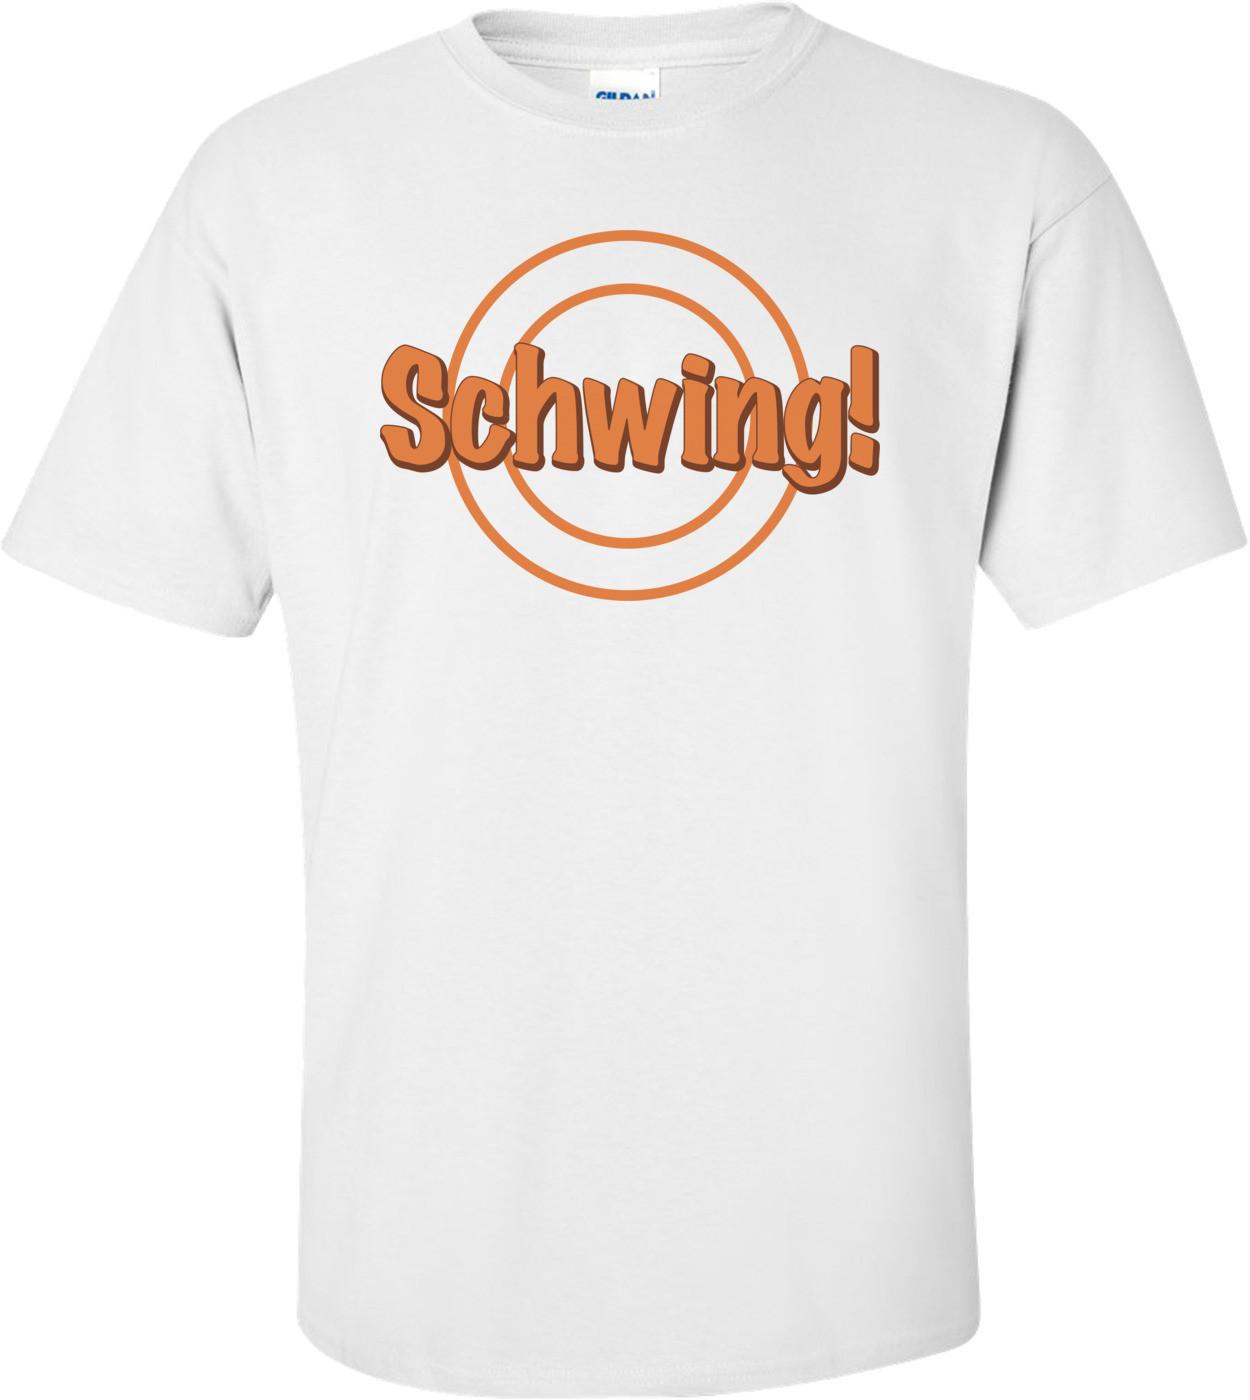 Schwing Wayne's World T-shirt